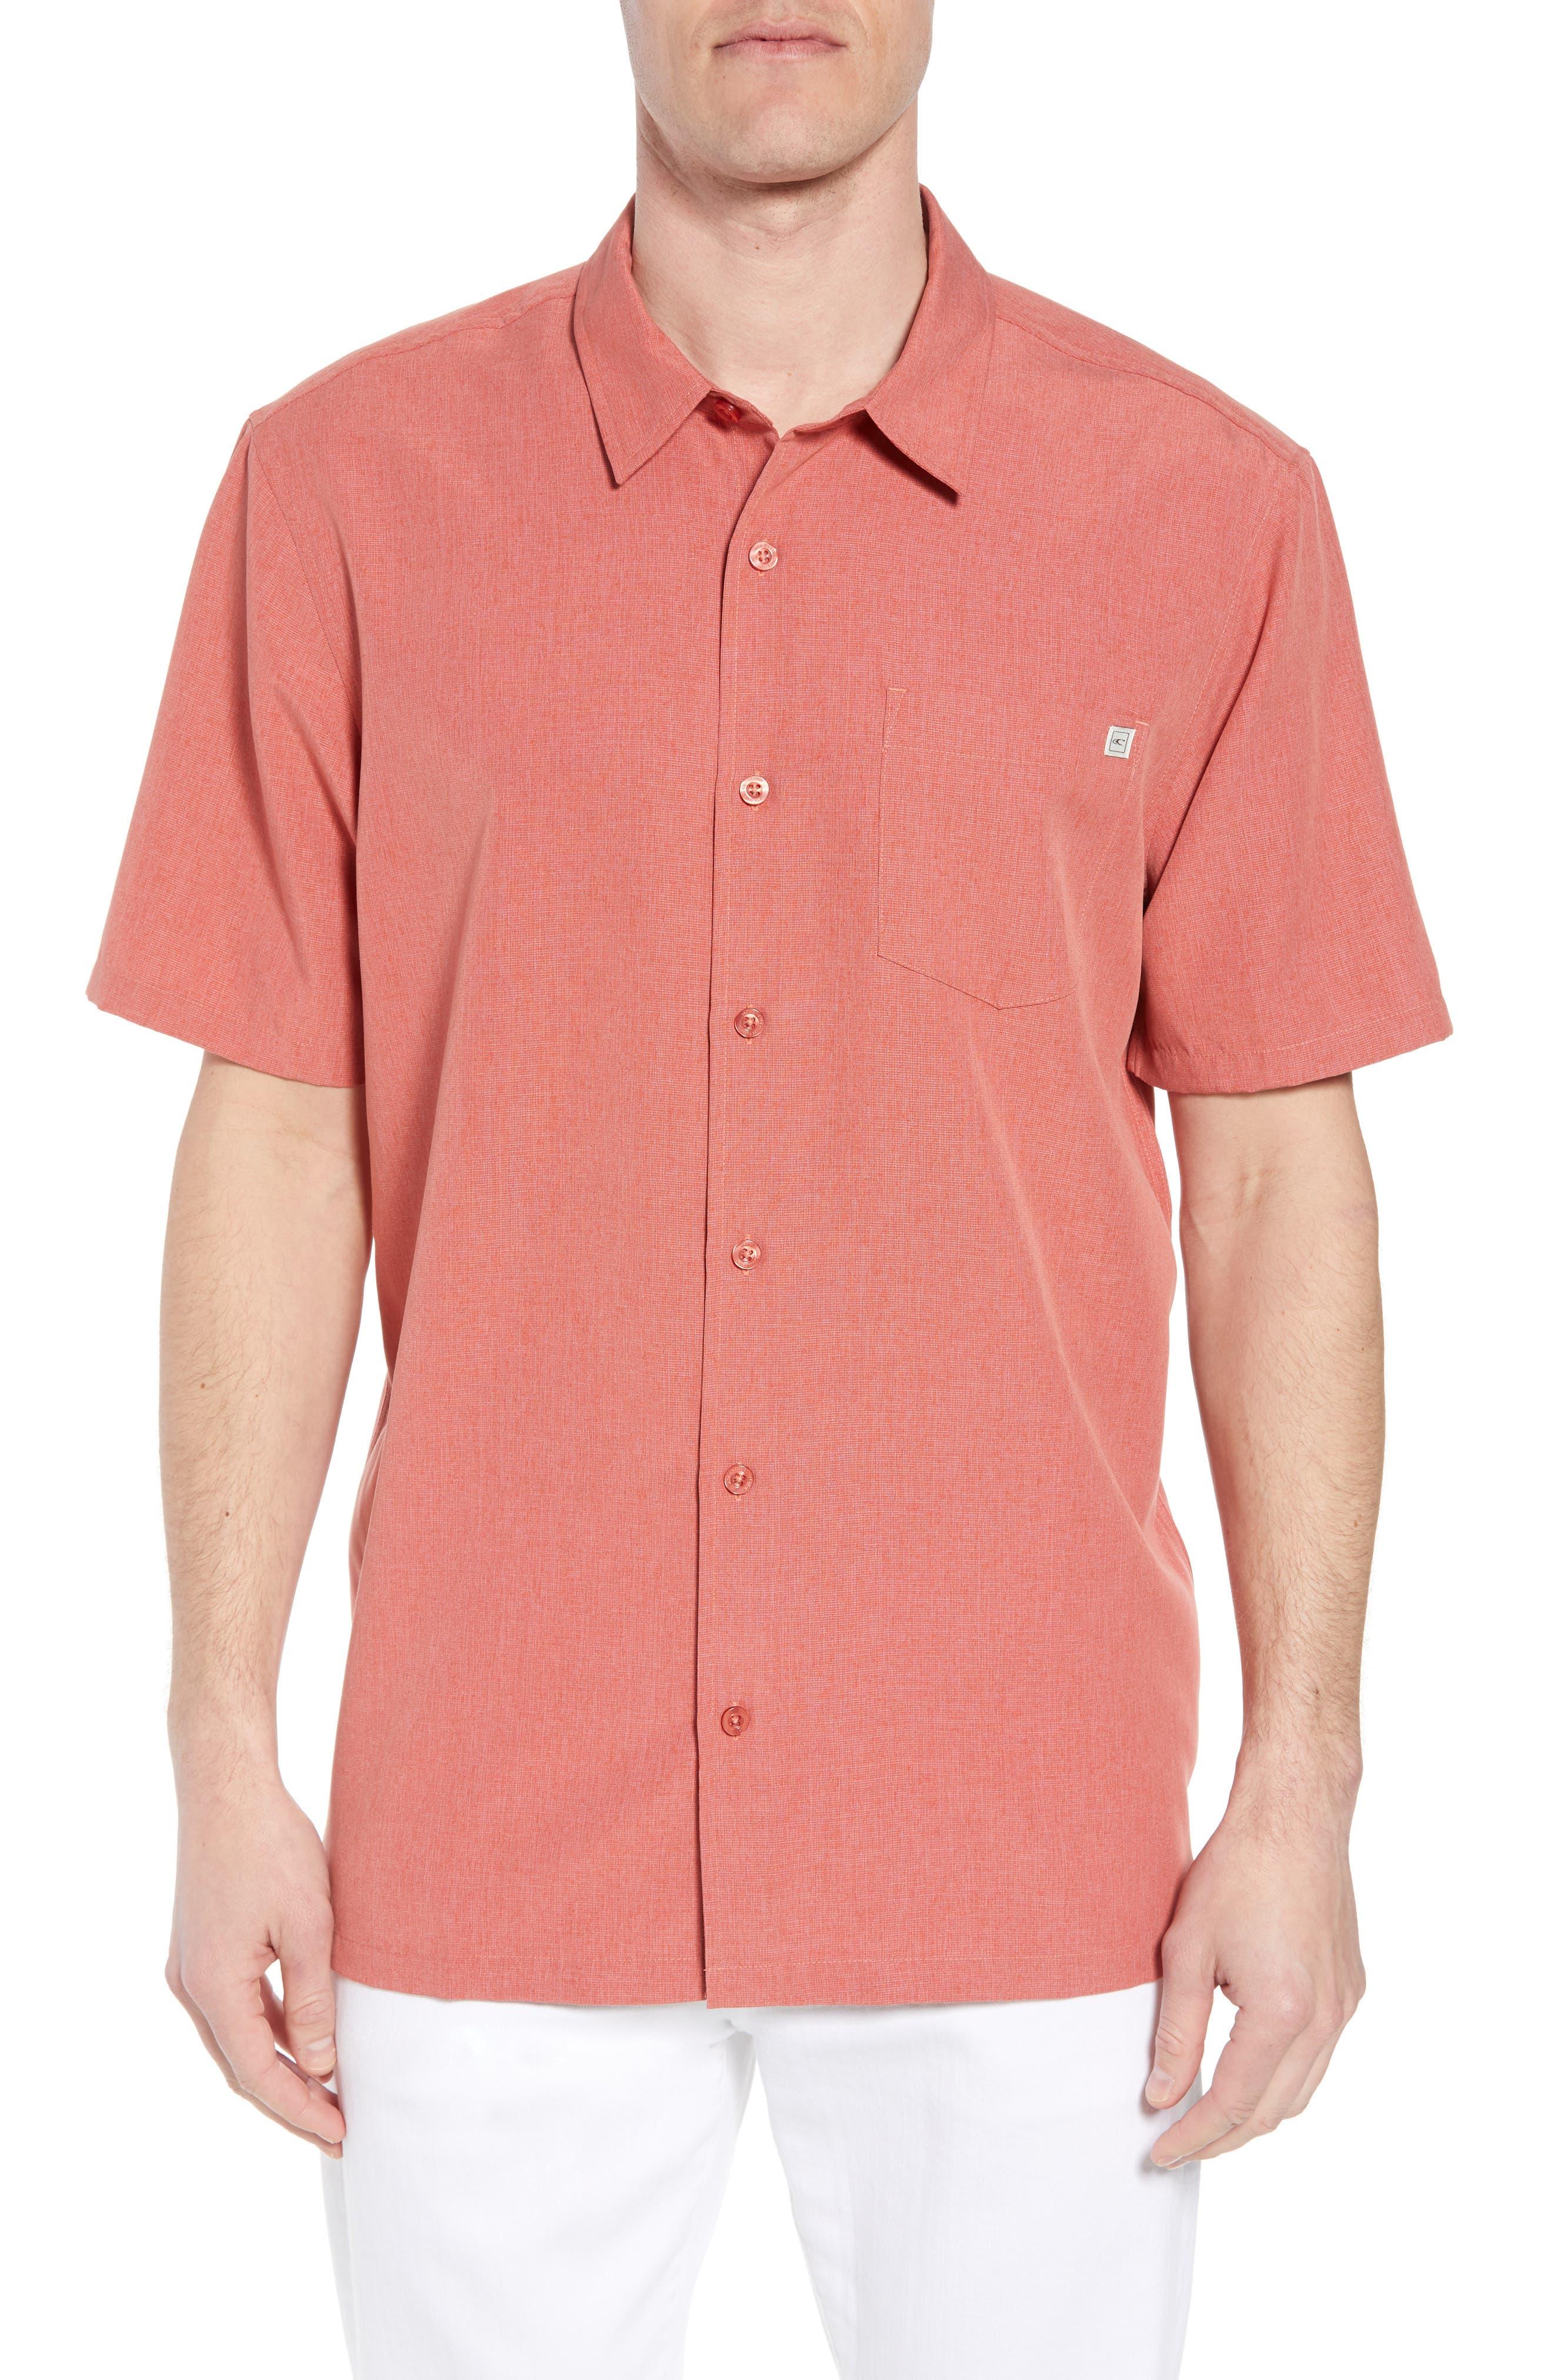 Liberty Sport Shirt,                         Main,                         color, Spice